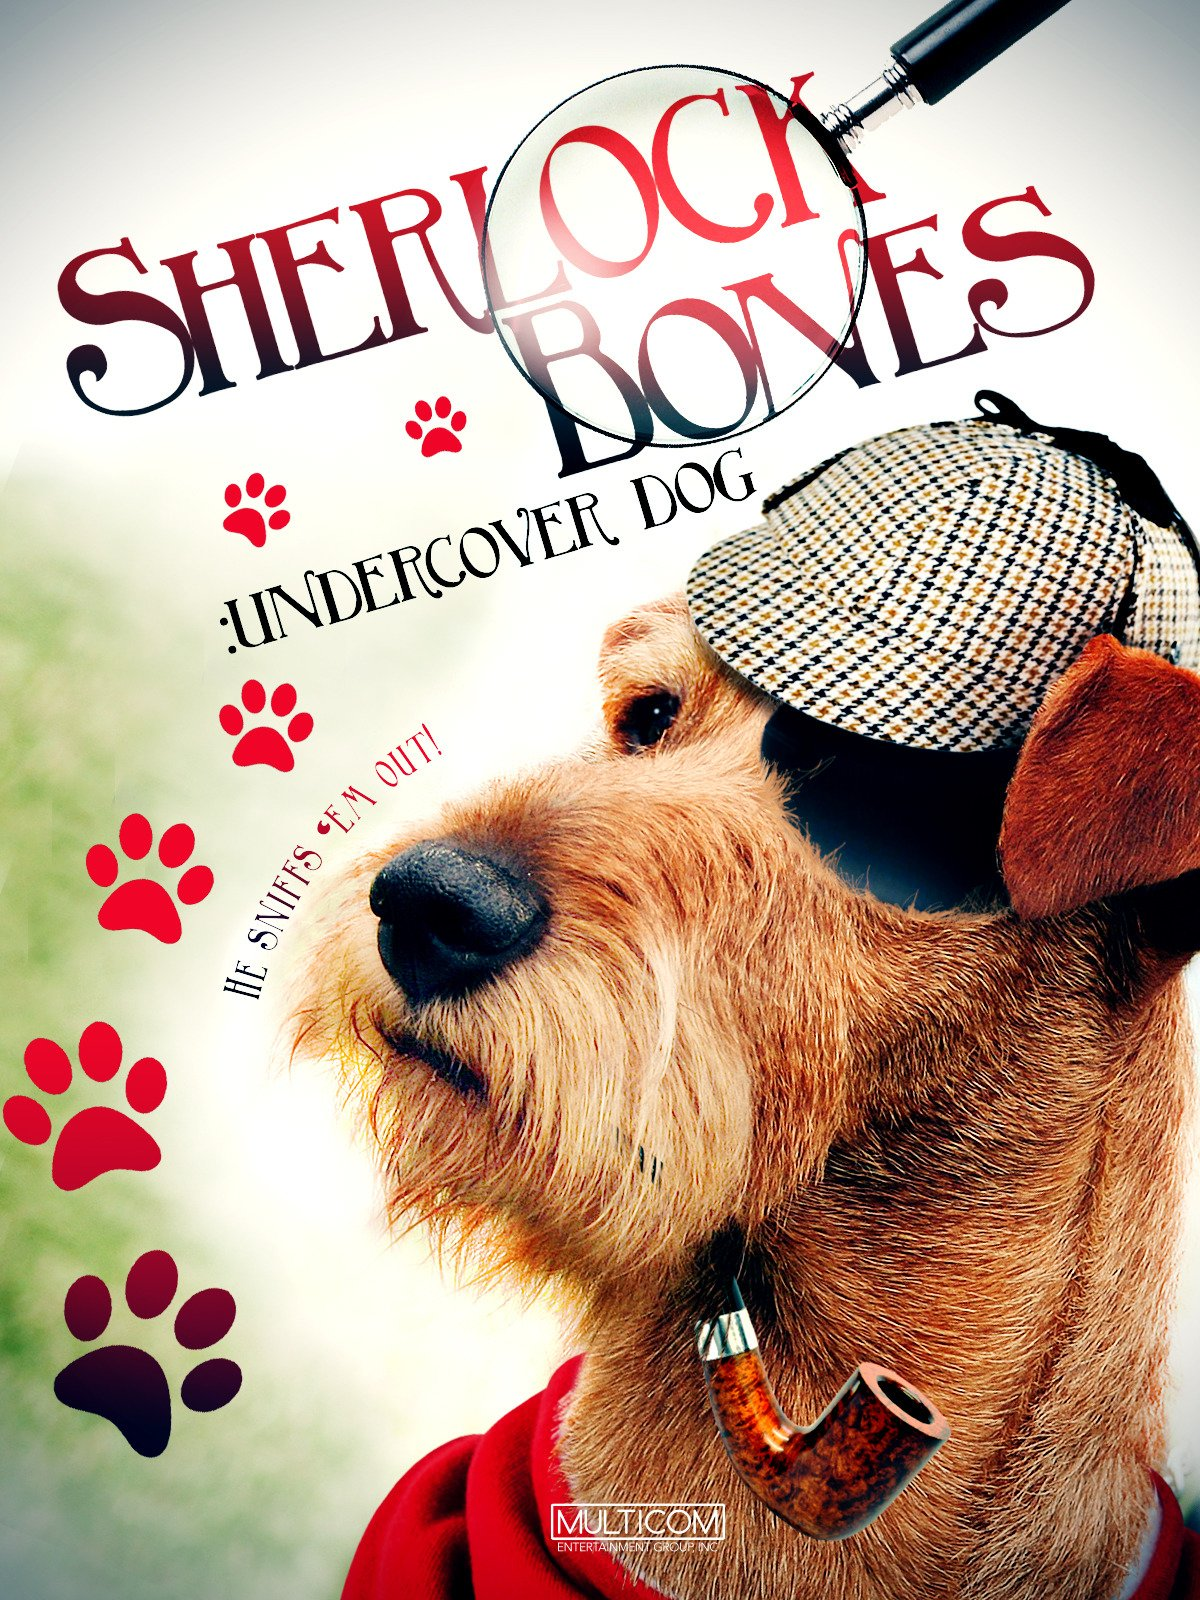 Sherlock Bones: Undercover Dog on Amazon Prime Video UK